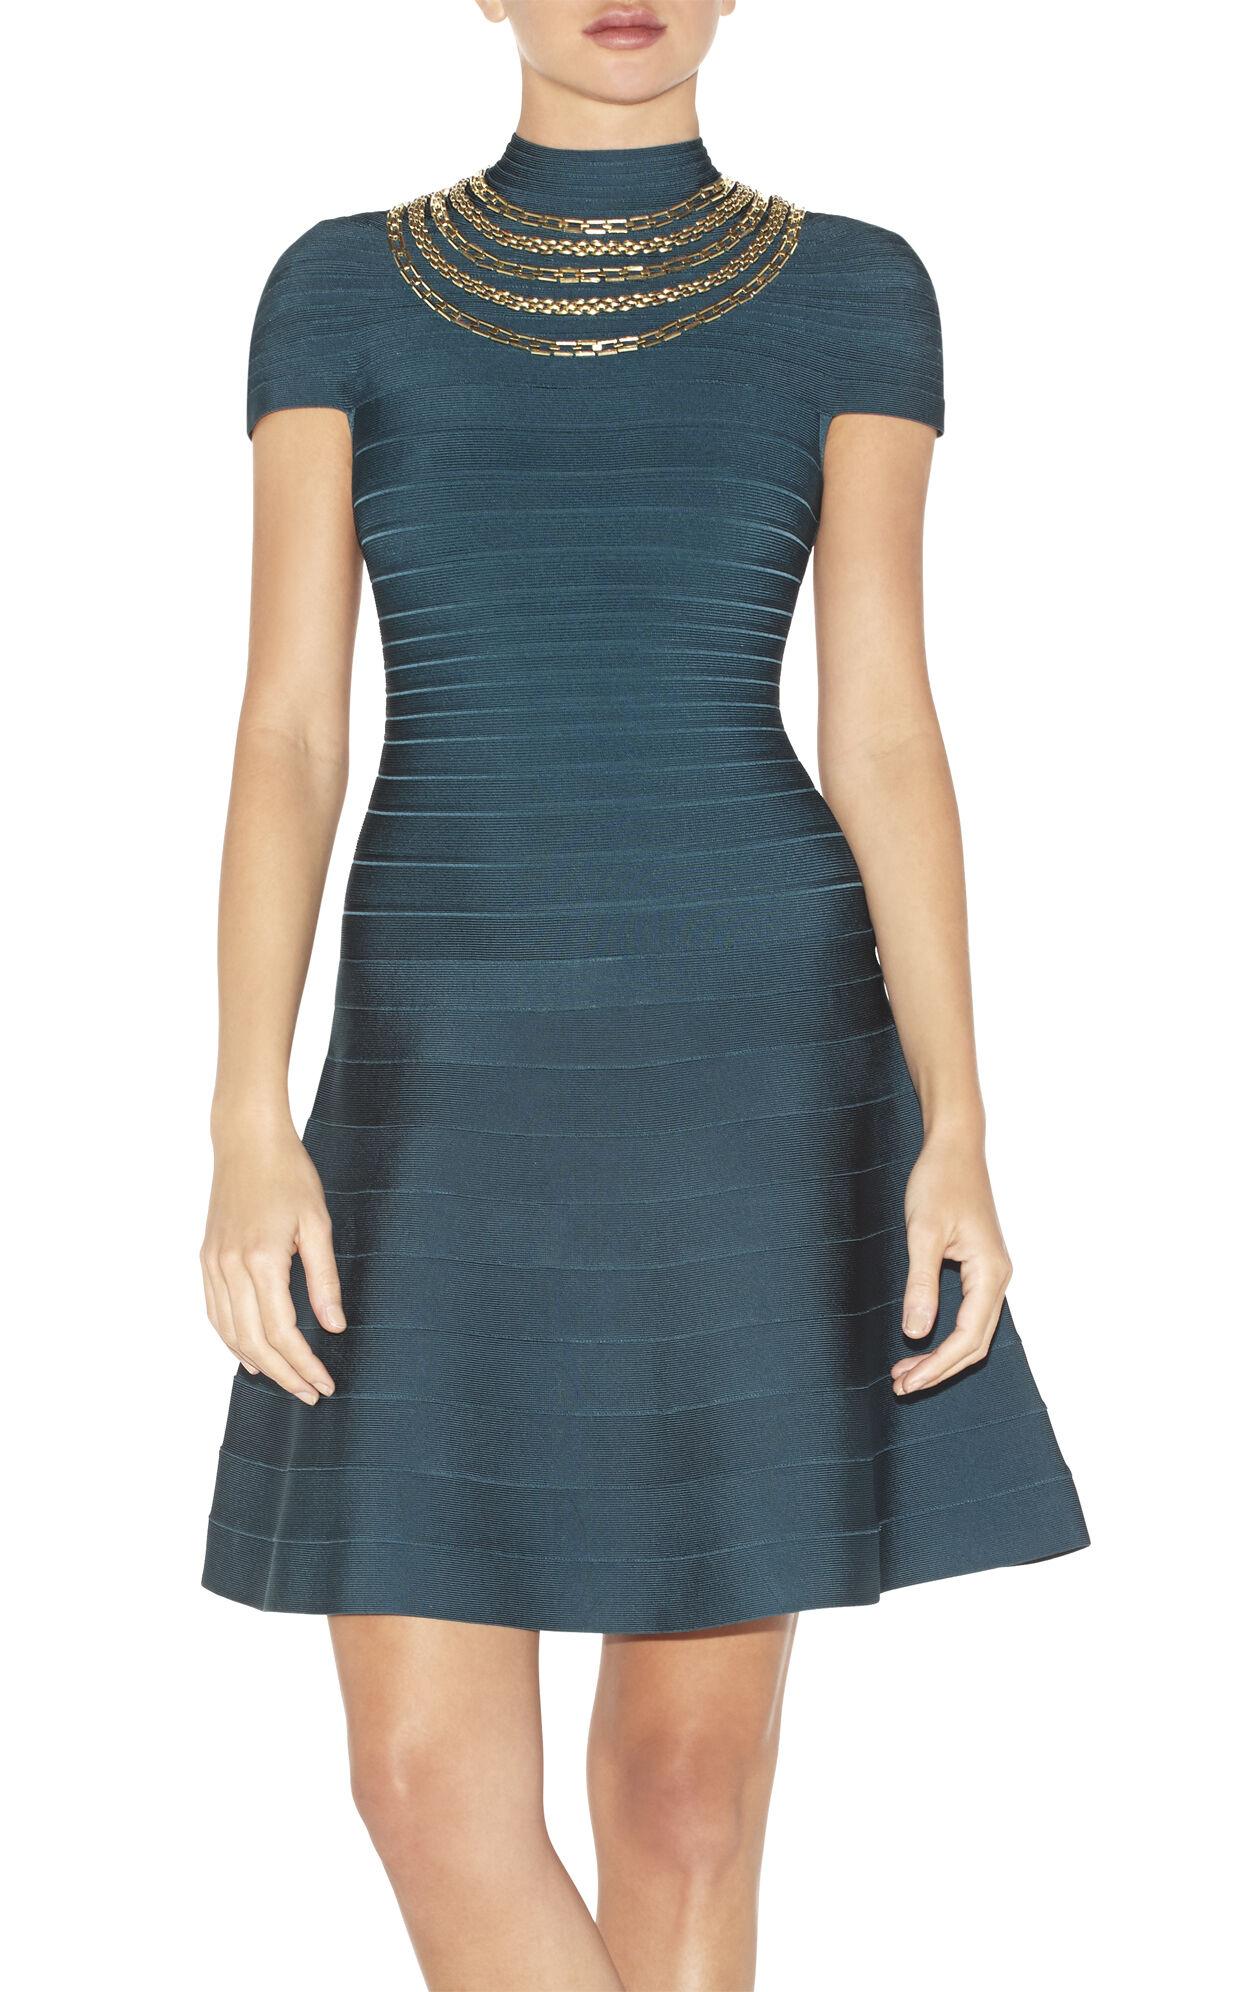 Tereza Chain-Detailed Beaded Dress